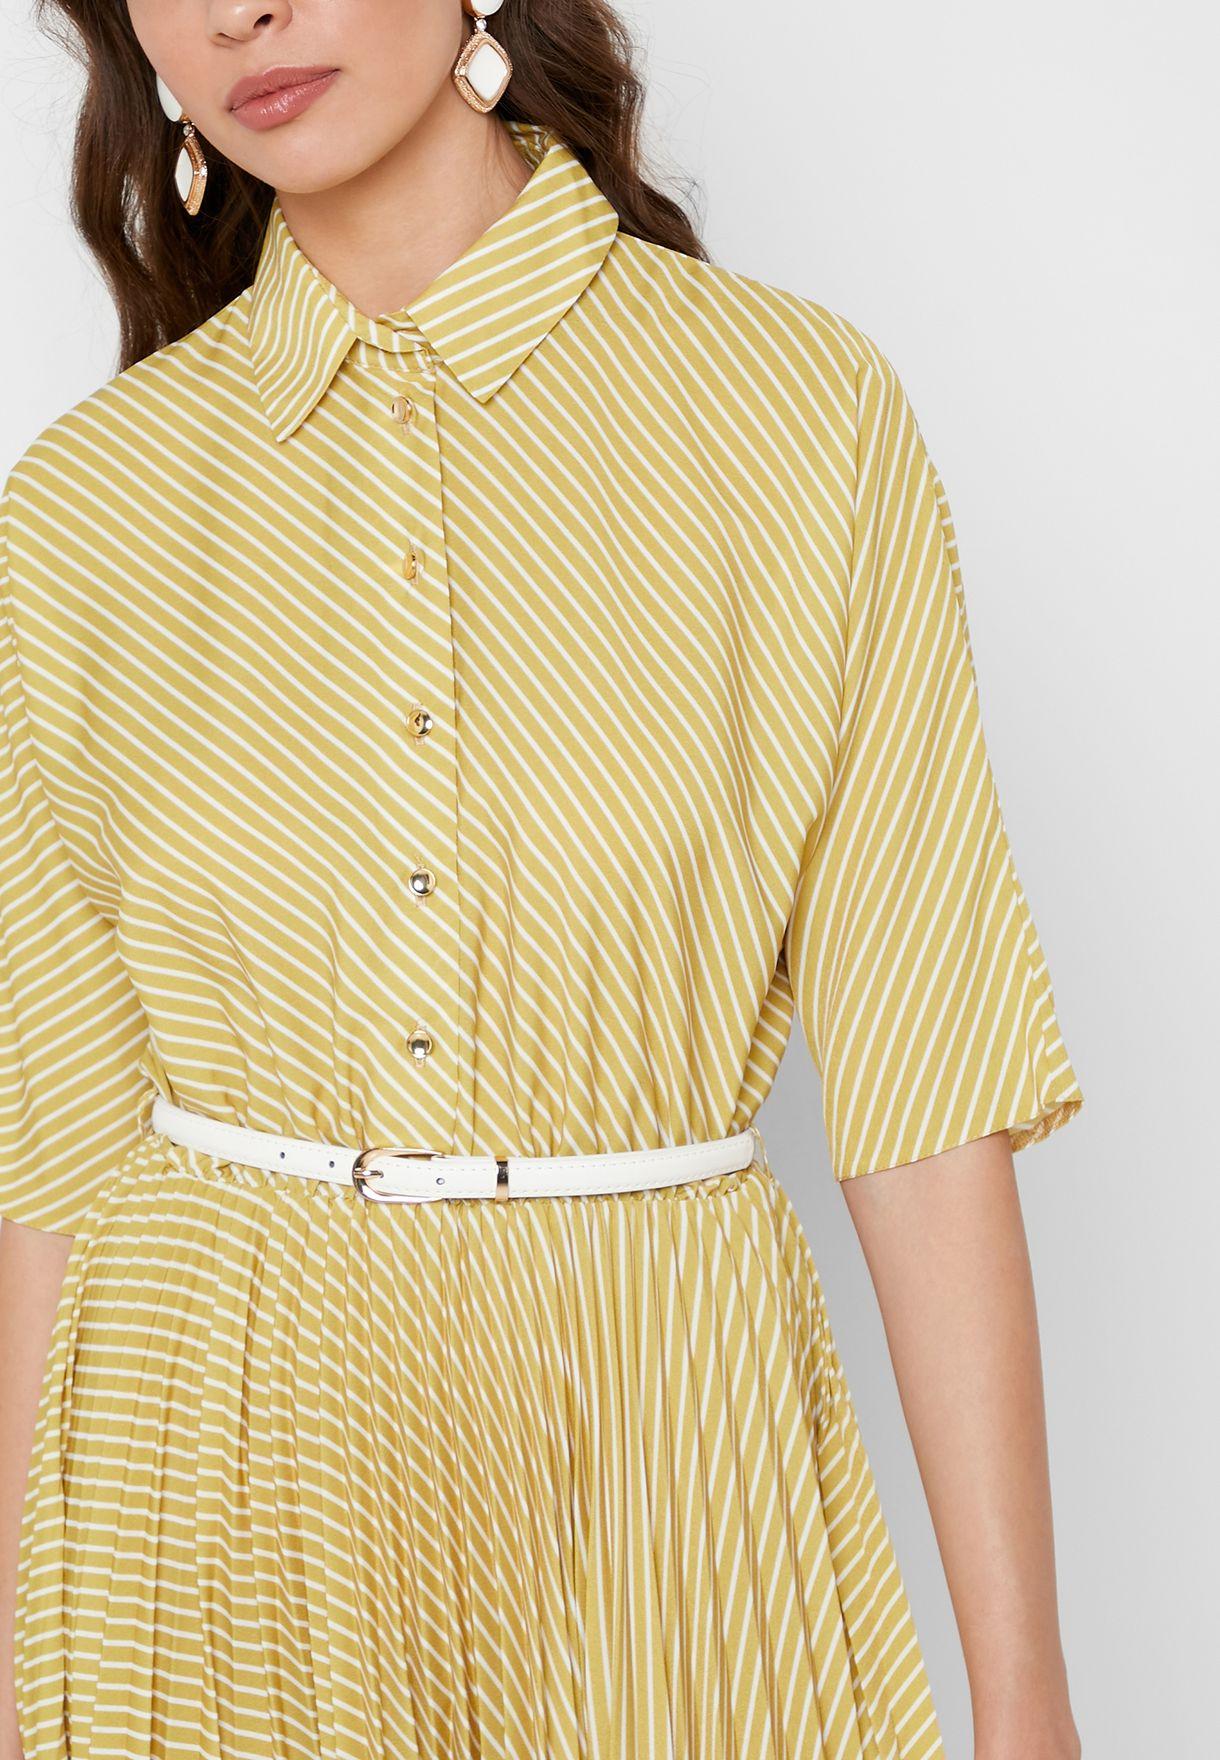 فستان بخطوط وحزام